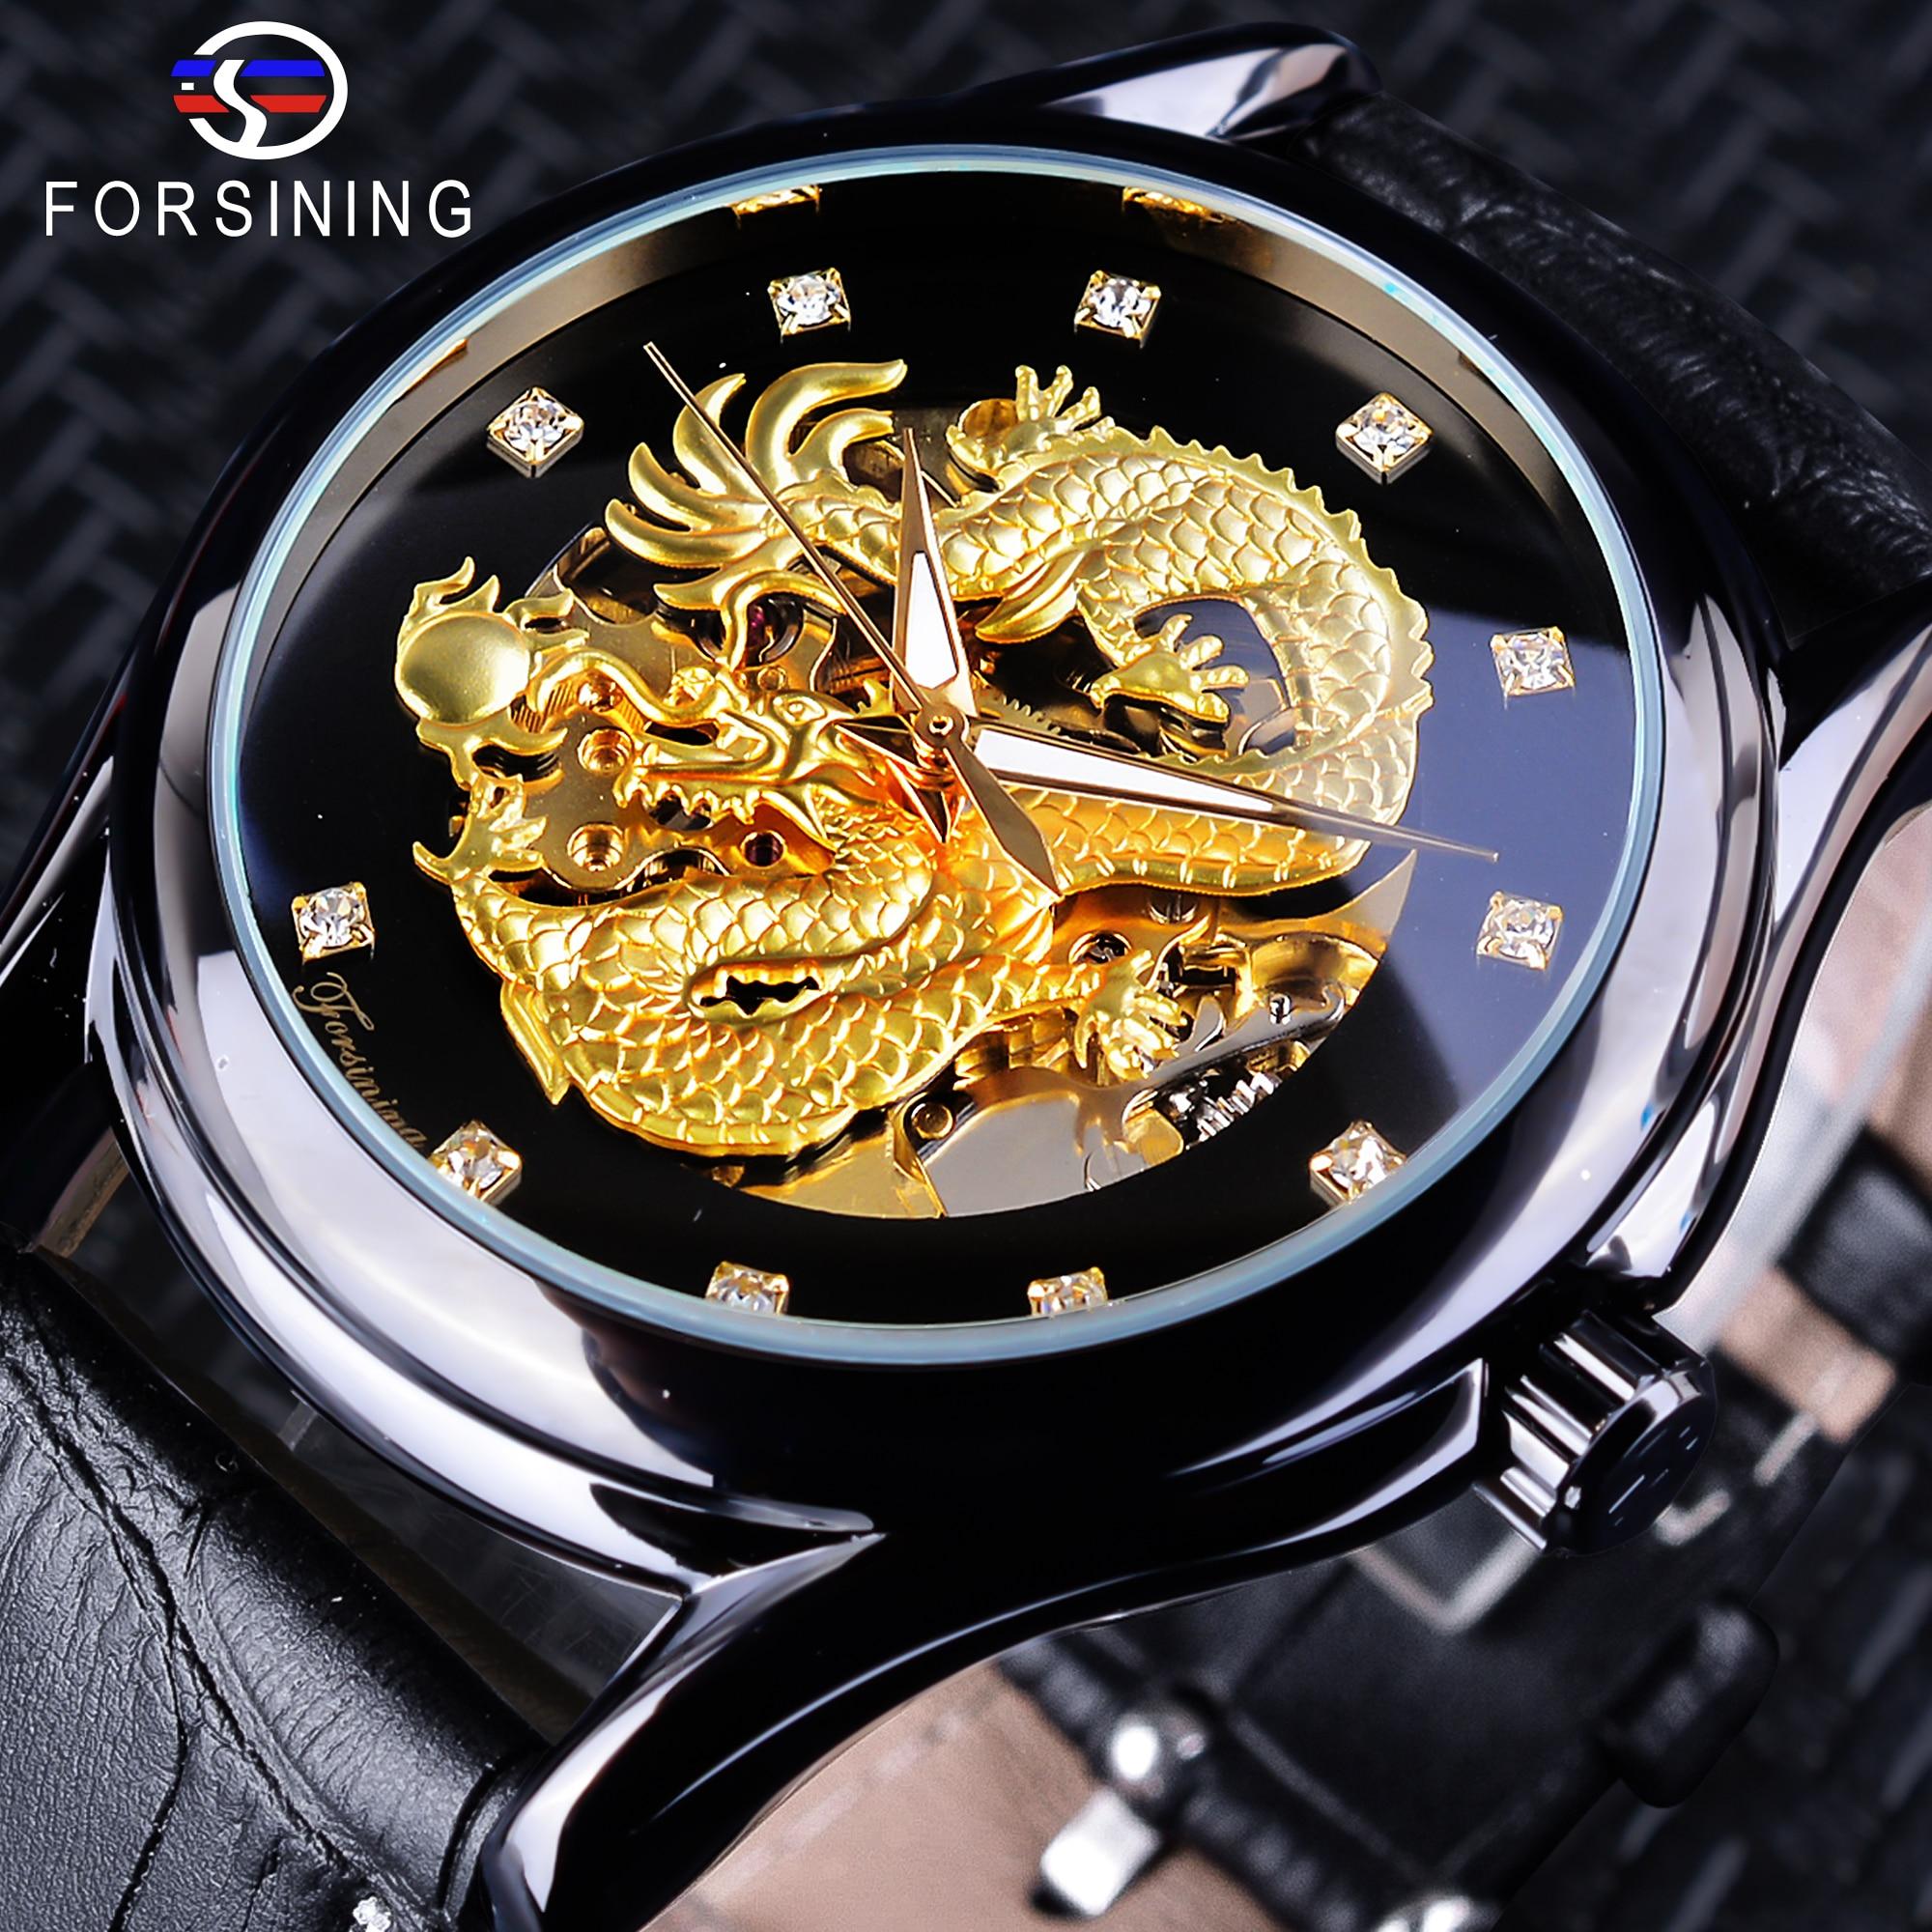 Forsining Chinese Dragon Design Diamond Dial Black Golden Men Watch Luminous Hands Top Brand Luxury Waterproof Mechanical Watch карабин black diamond black diamond rocklock twistlock